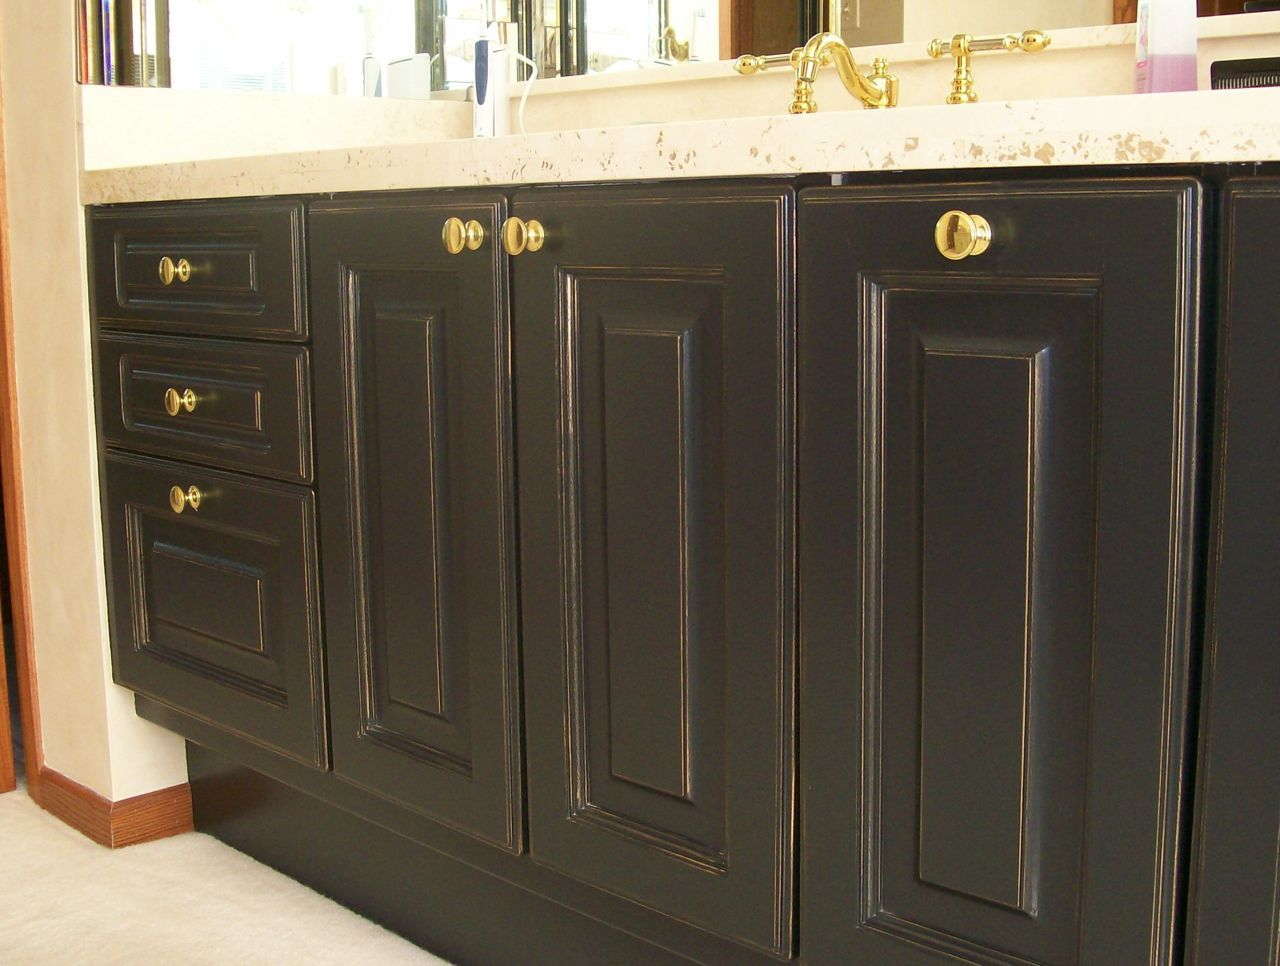 Refinishing Old Oak Cabinets